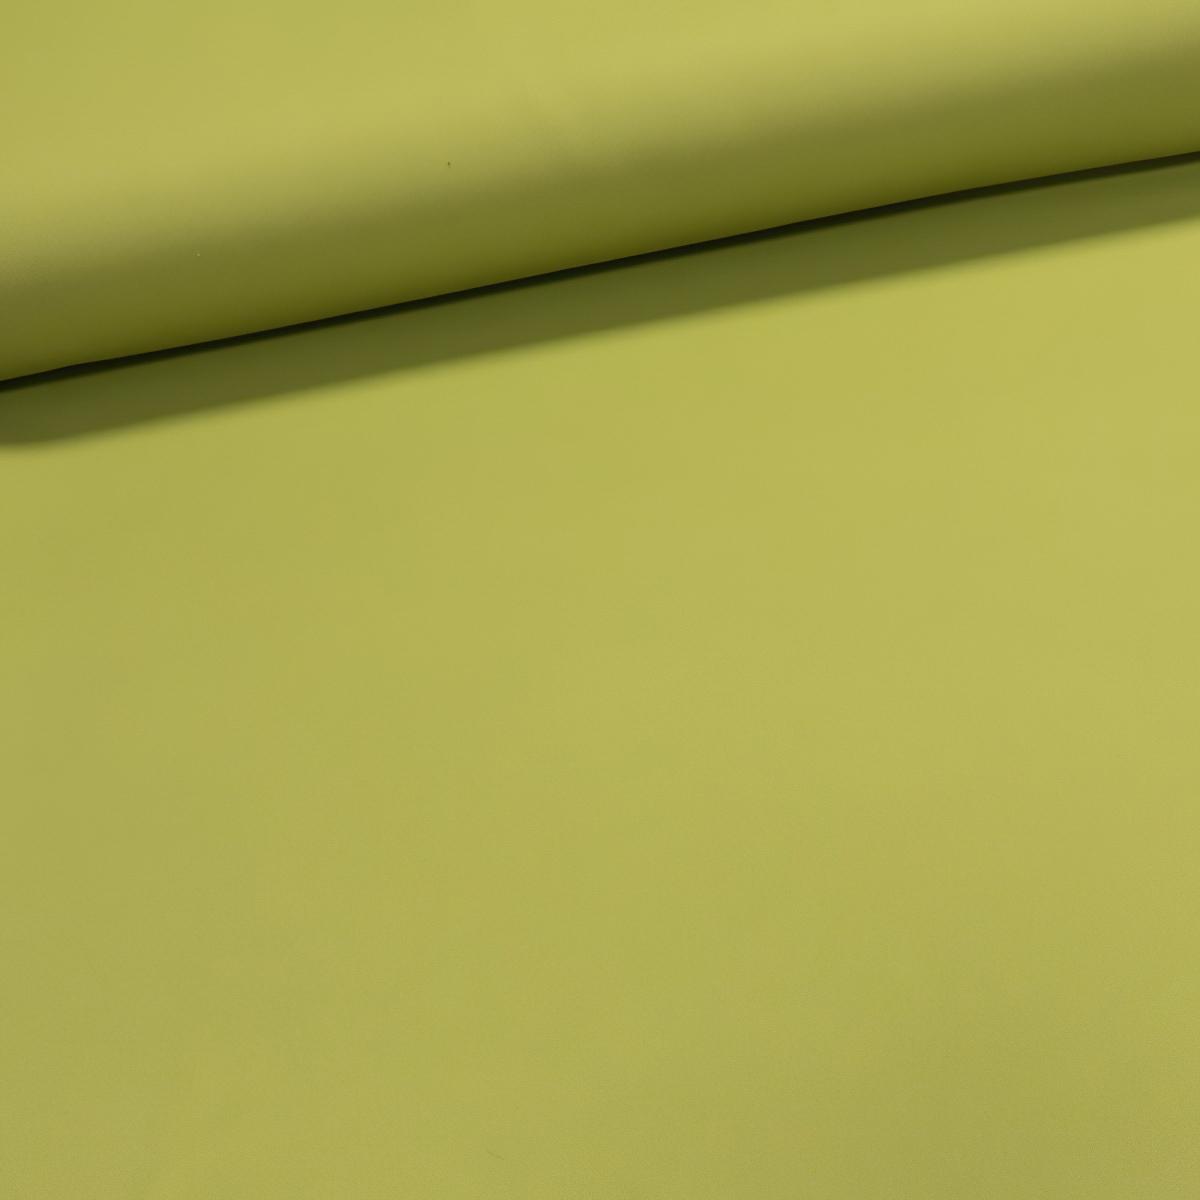 Rovitex Zatemňovací závěs, blackout SAN DIEGO 711 zelený, šířka 150cm (látka v metráži)